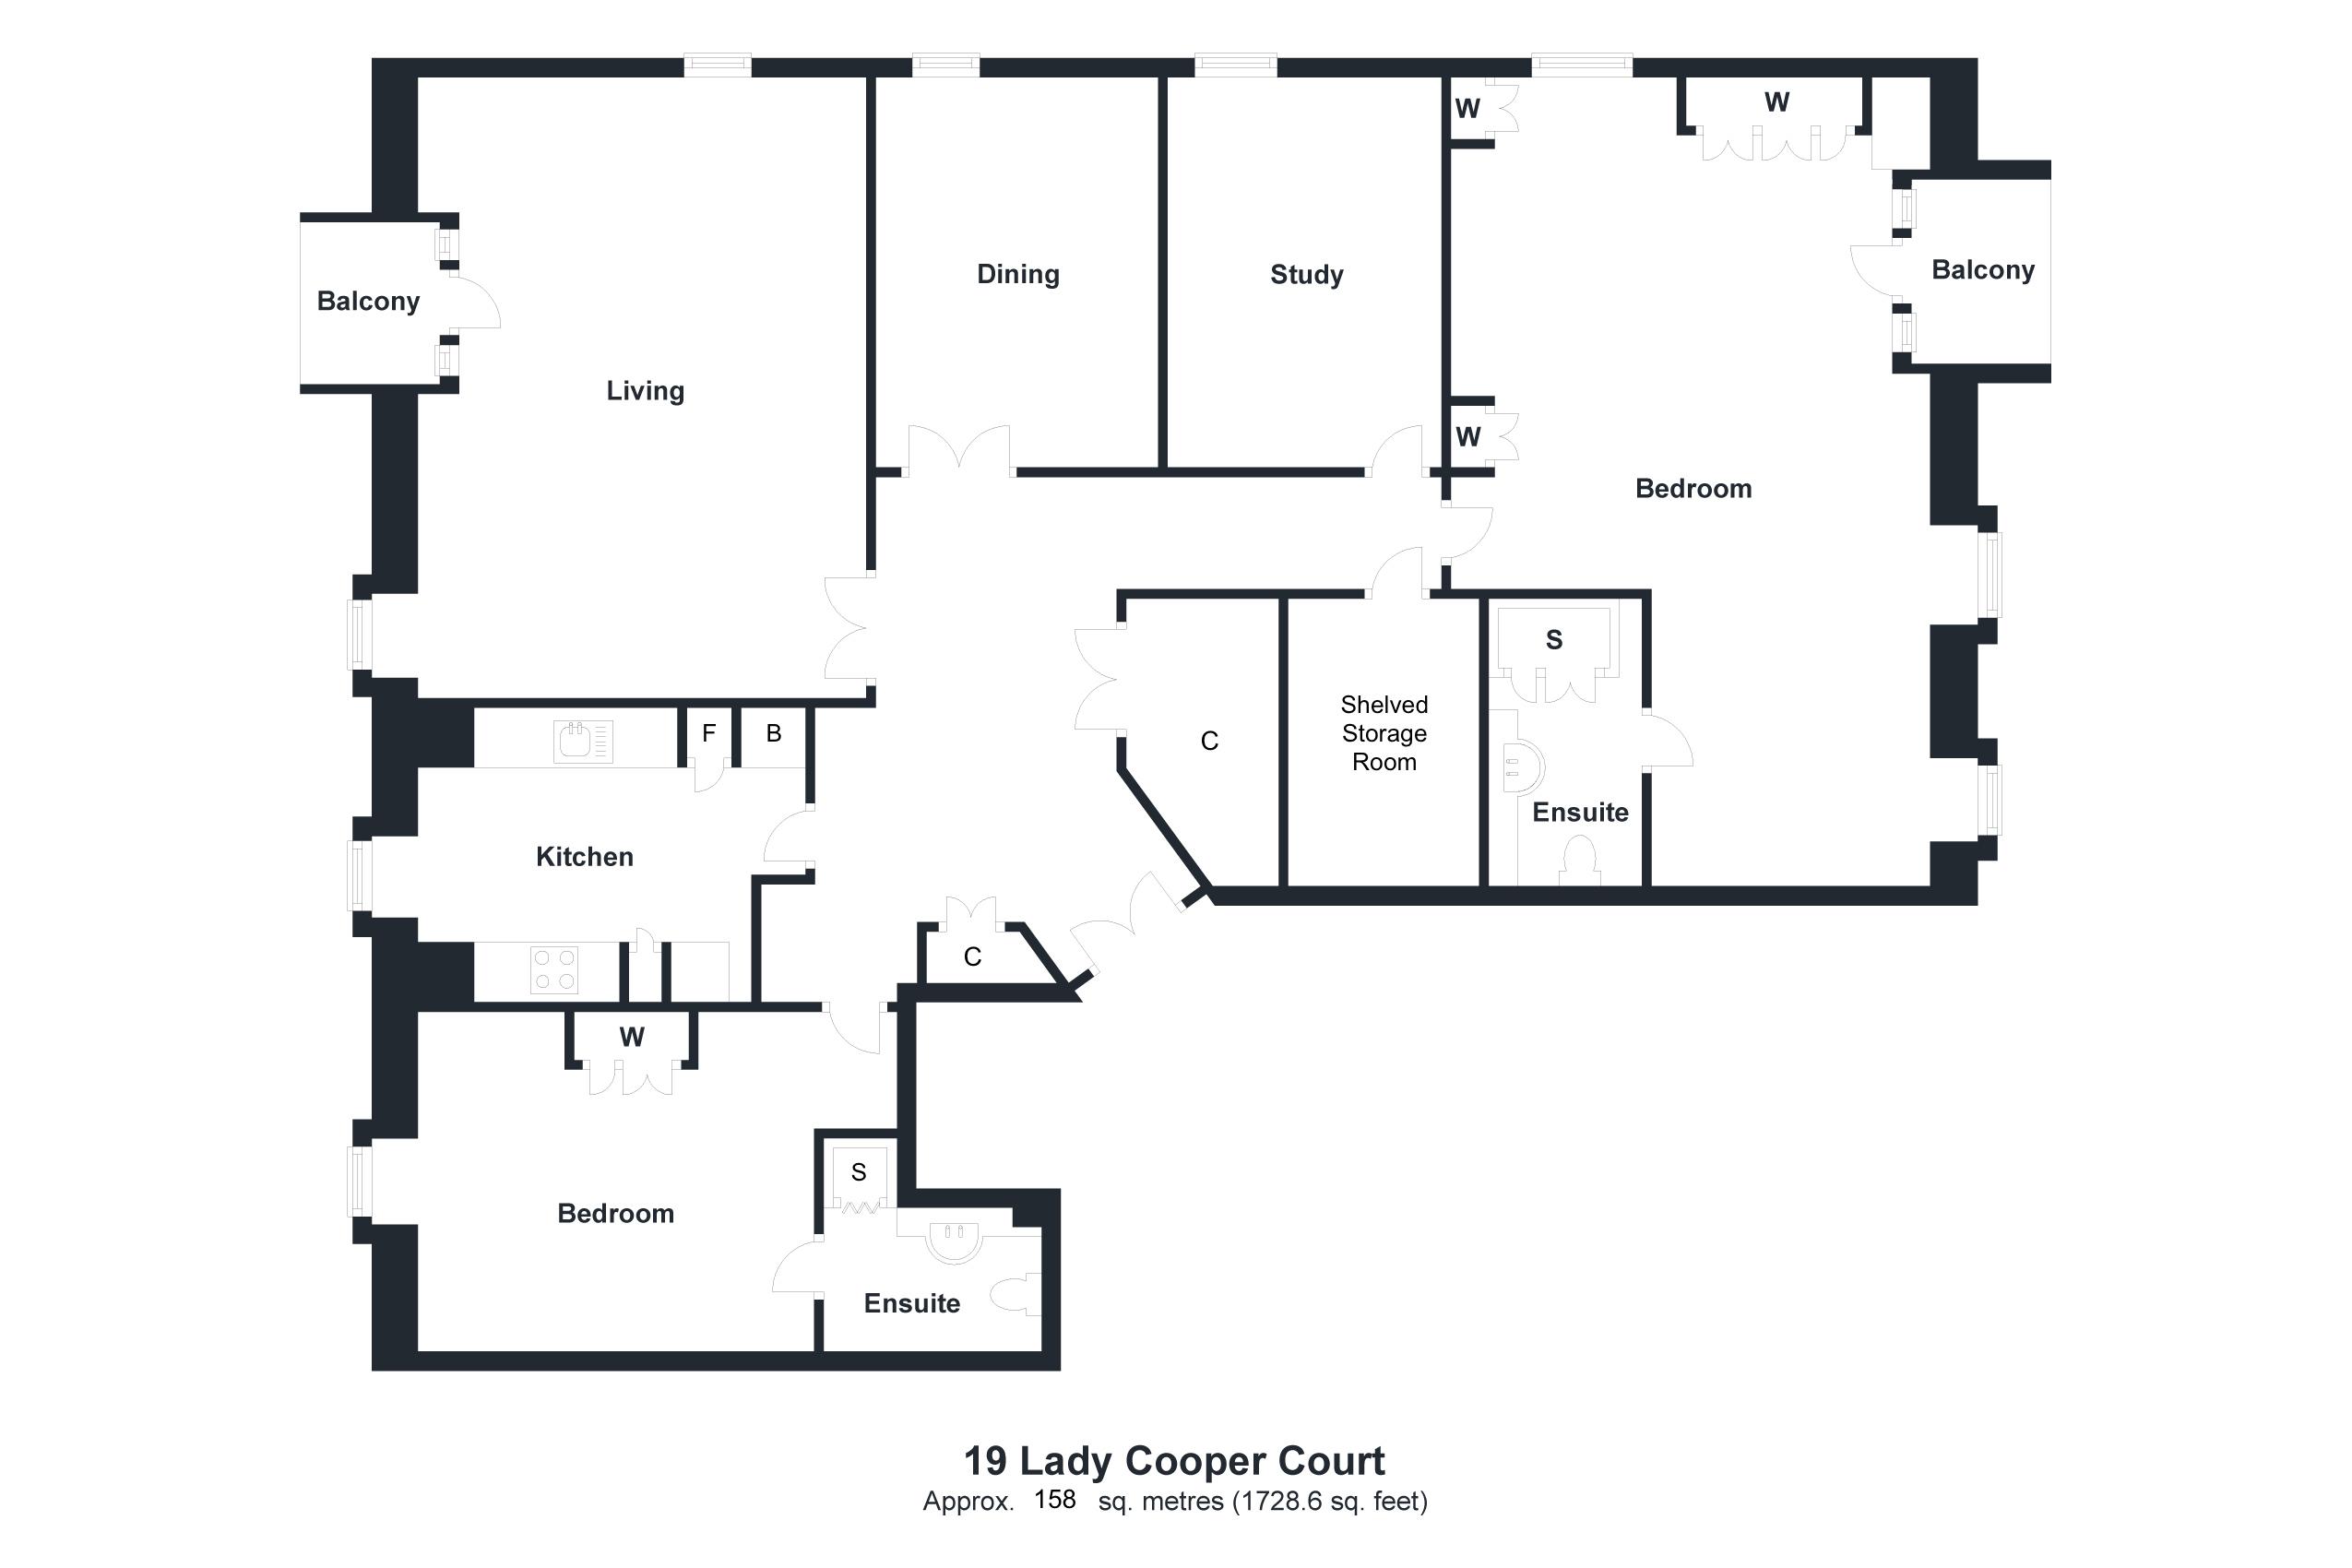 19 Lady Cooper Court Floorplan